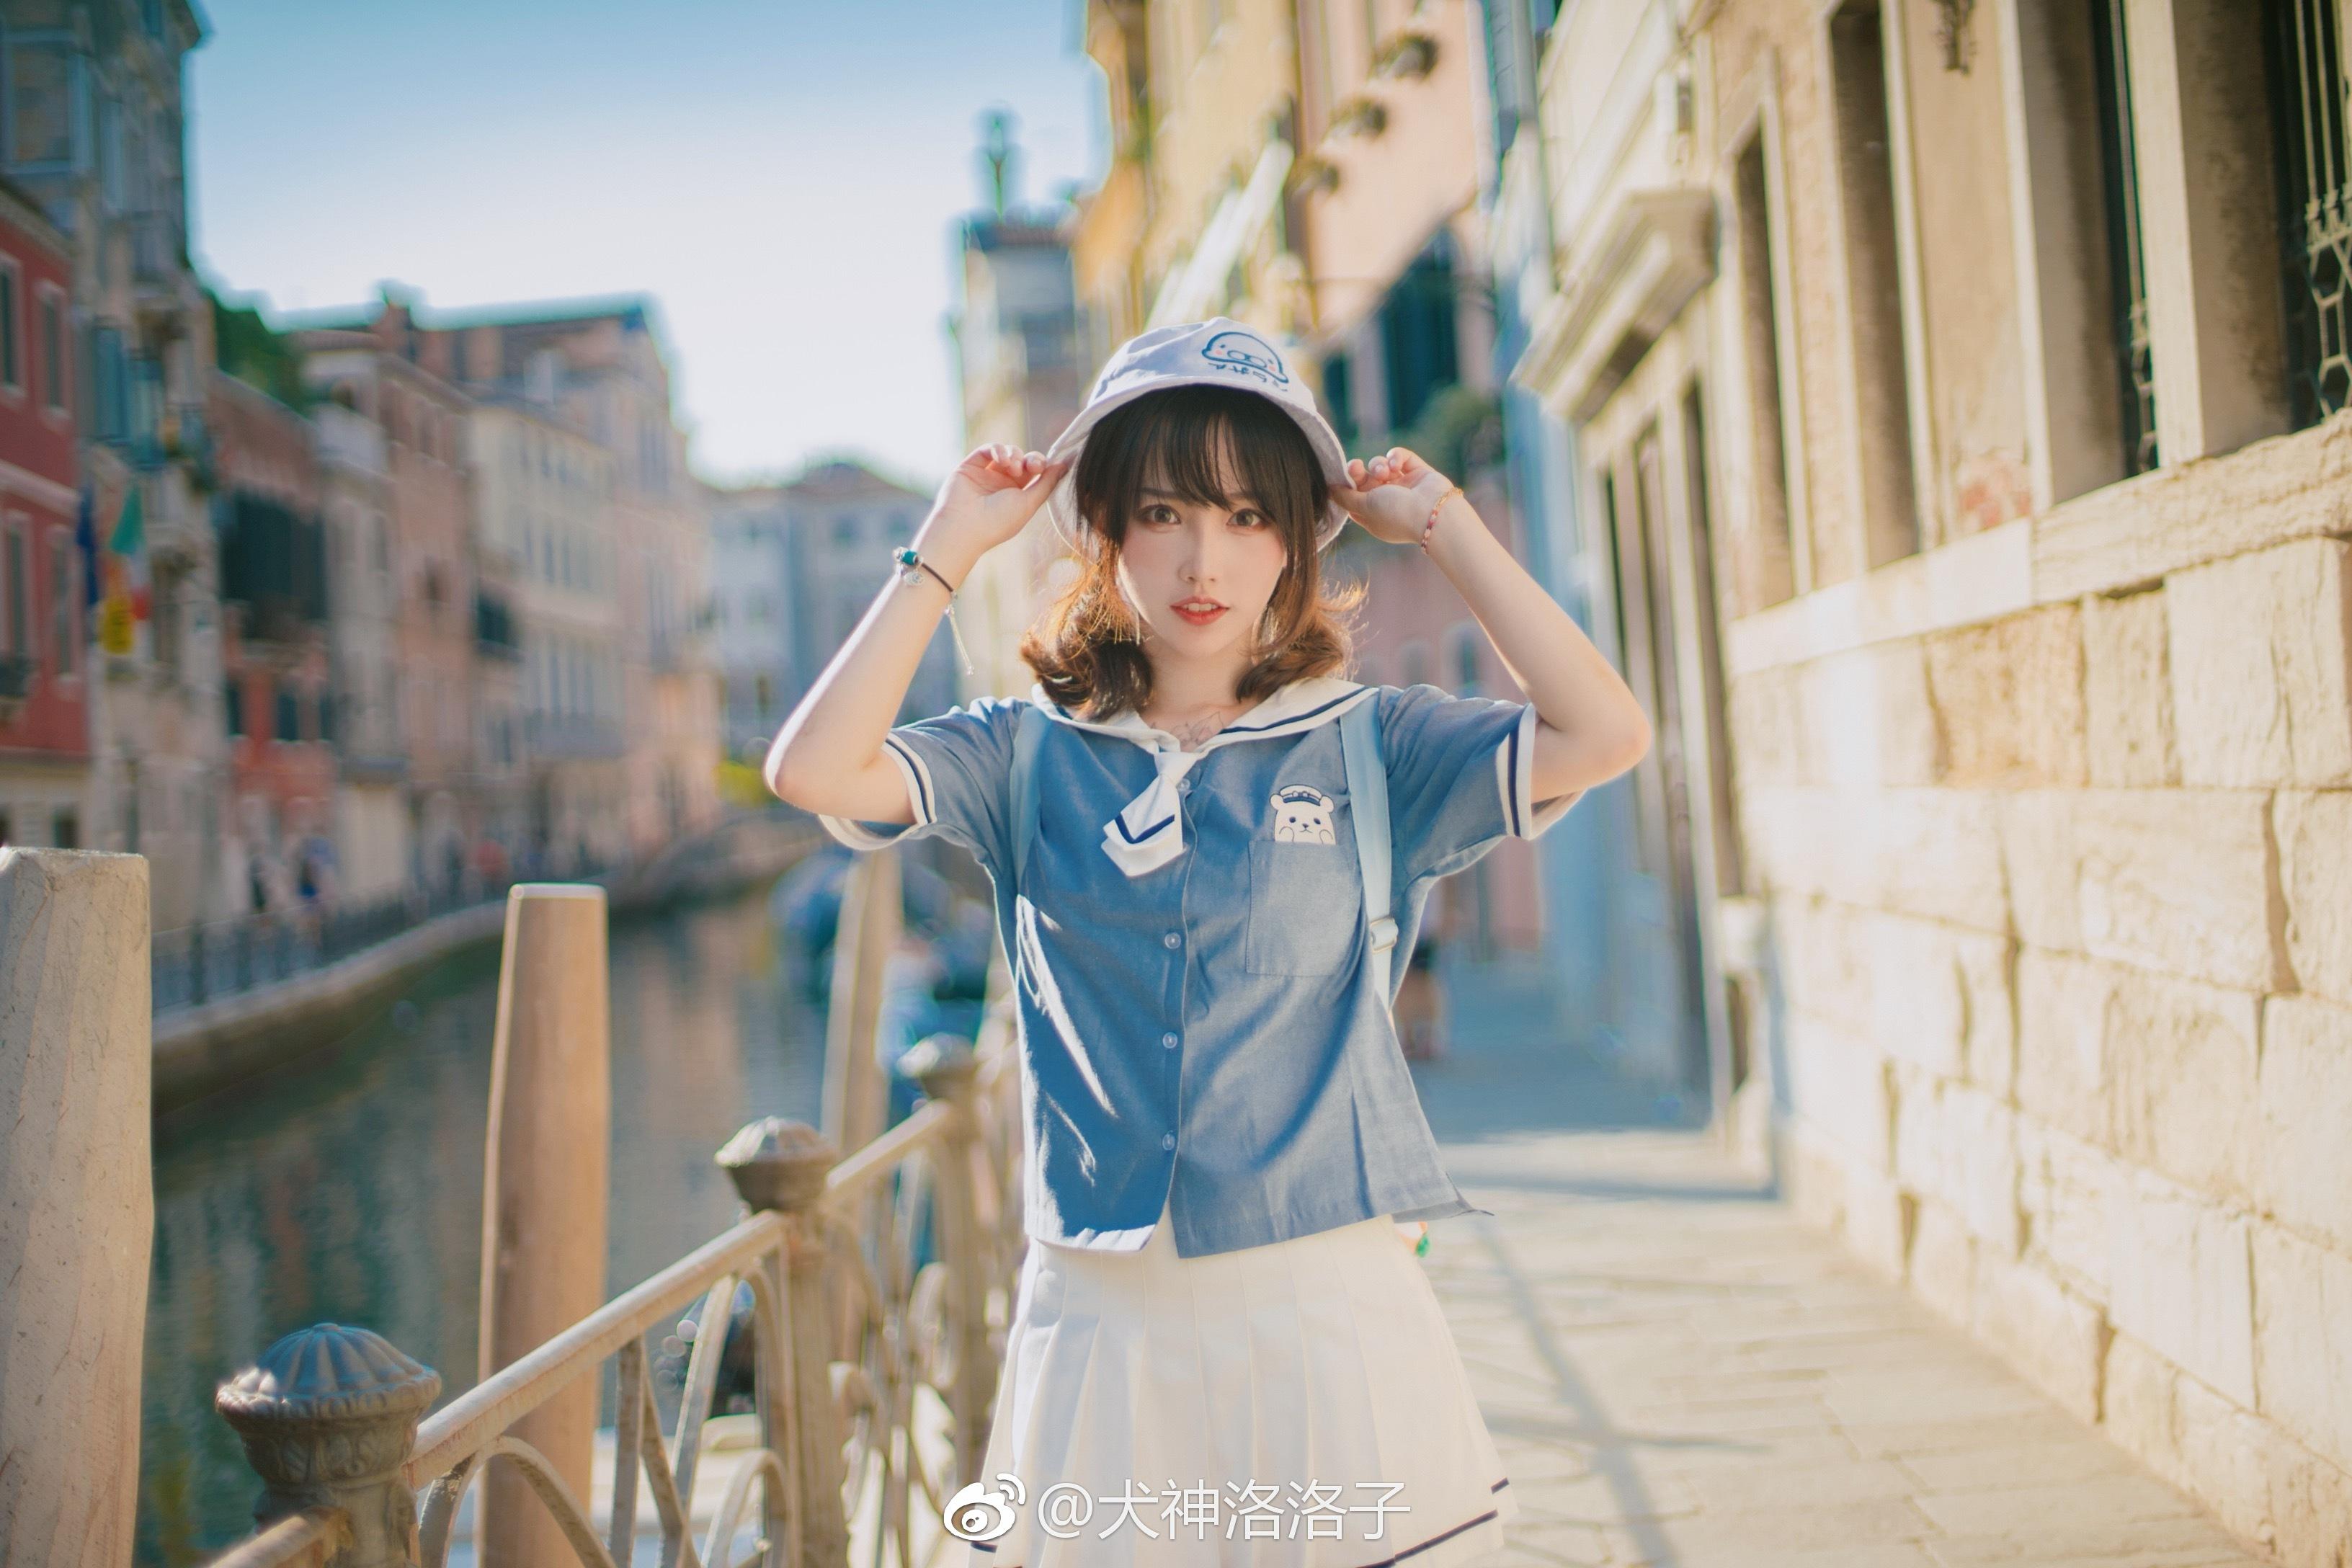 Venezia Girl